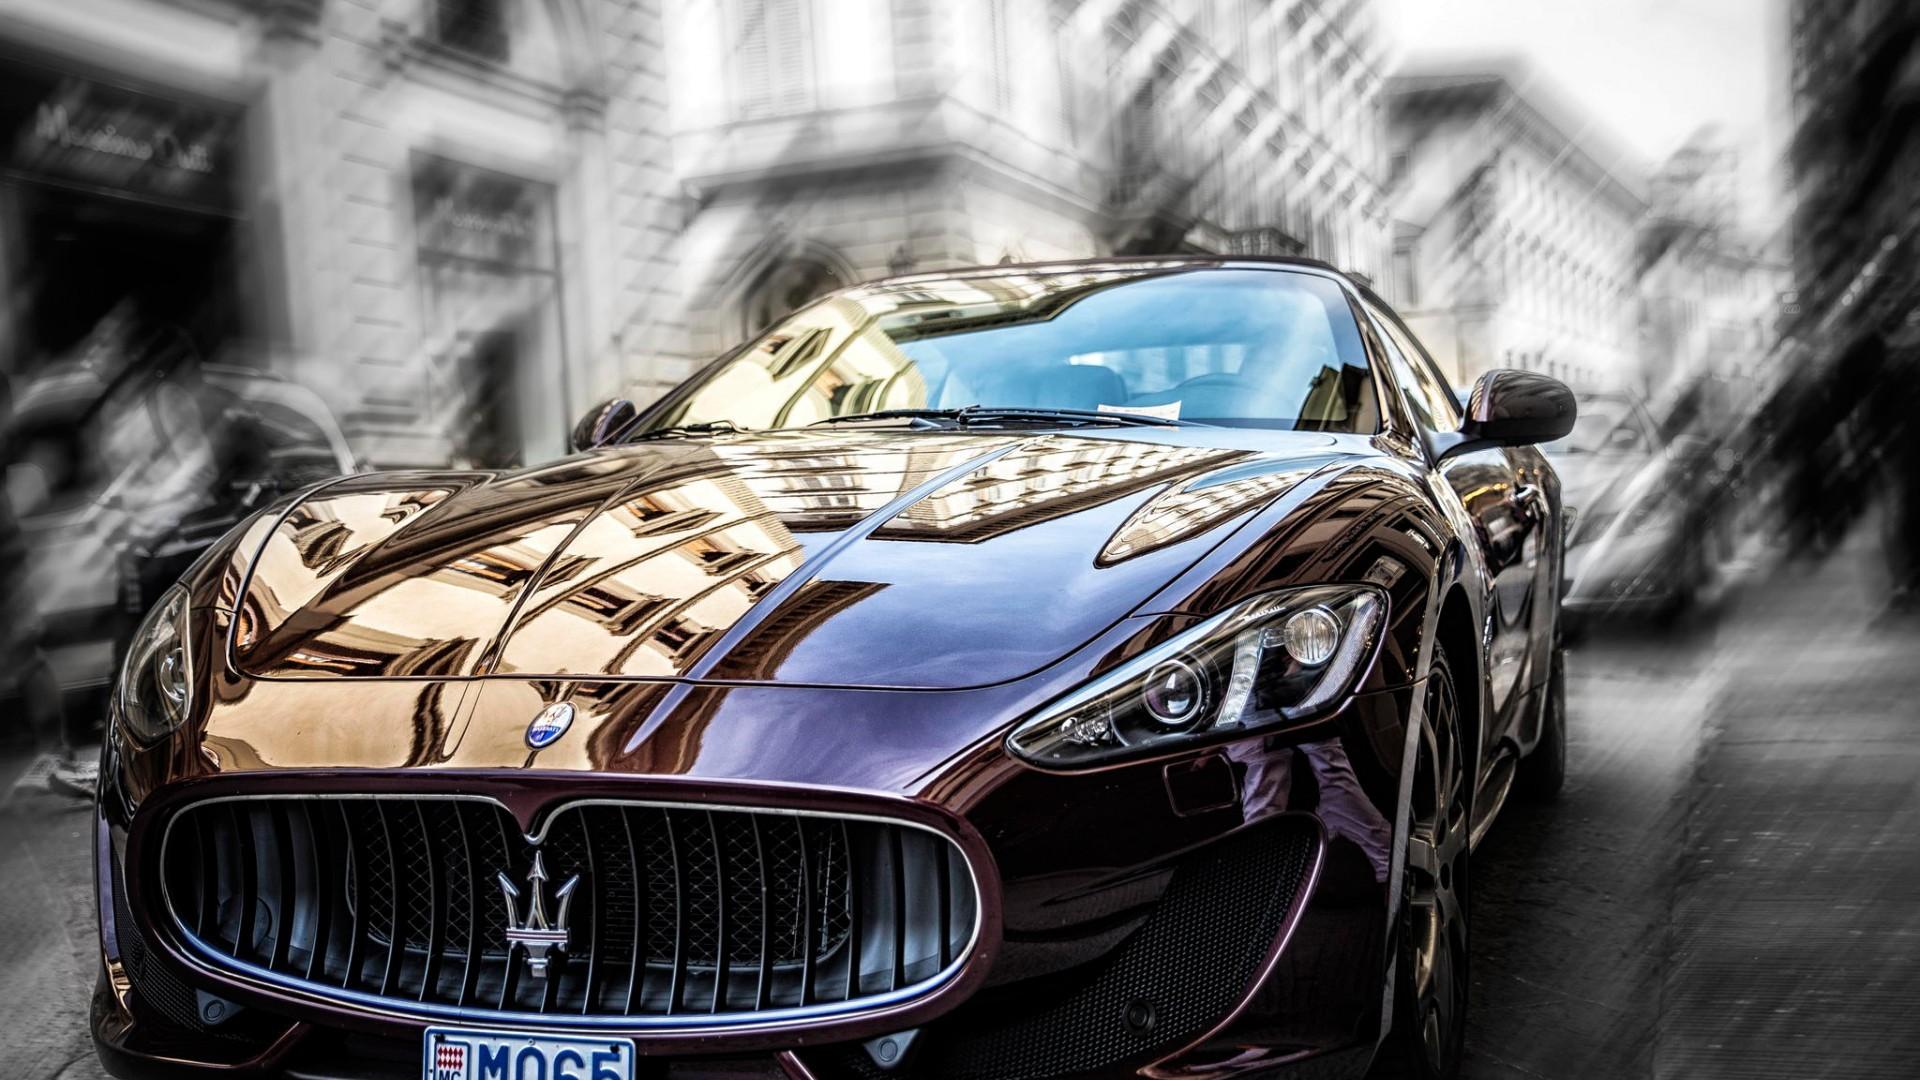 Marvelous 1920x1080 Px Car Coupe Italian Cars Maserati Maserati GranTurismo MC  Stradale